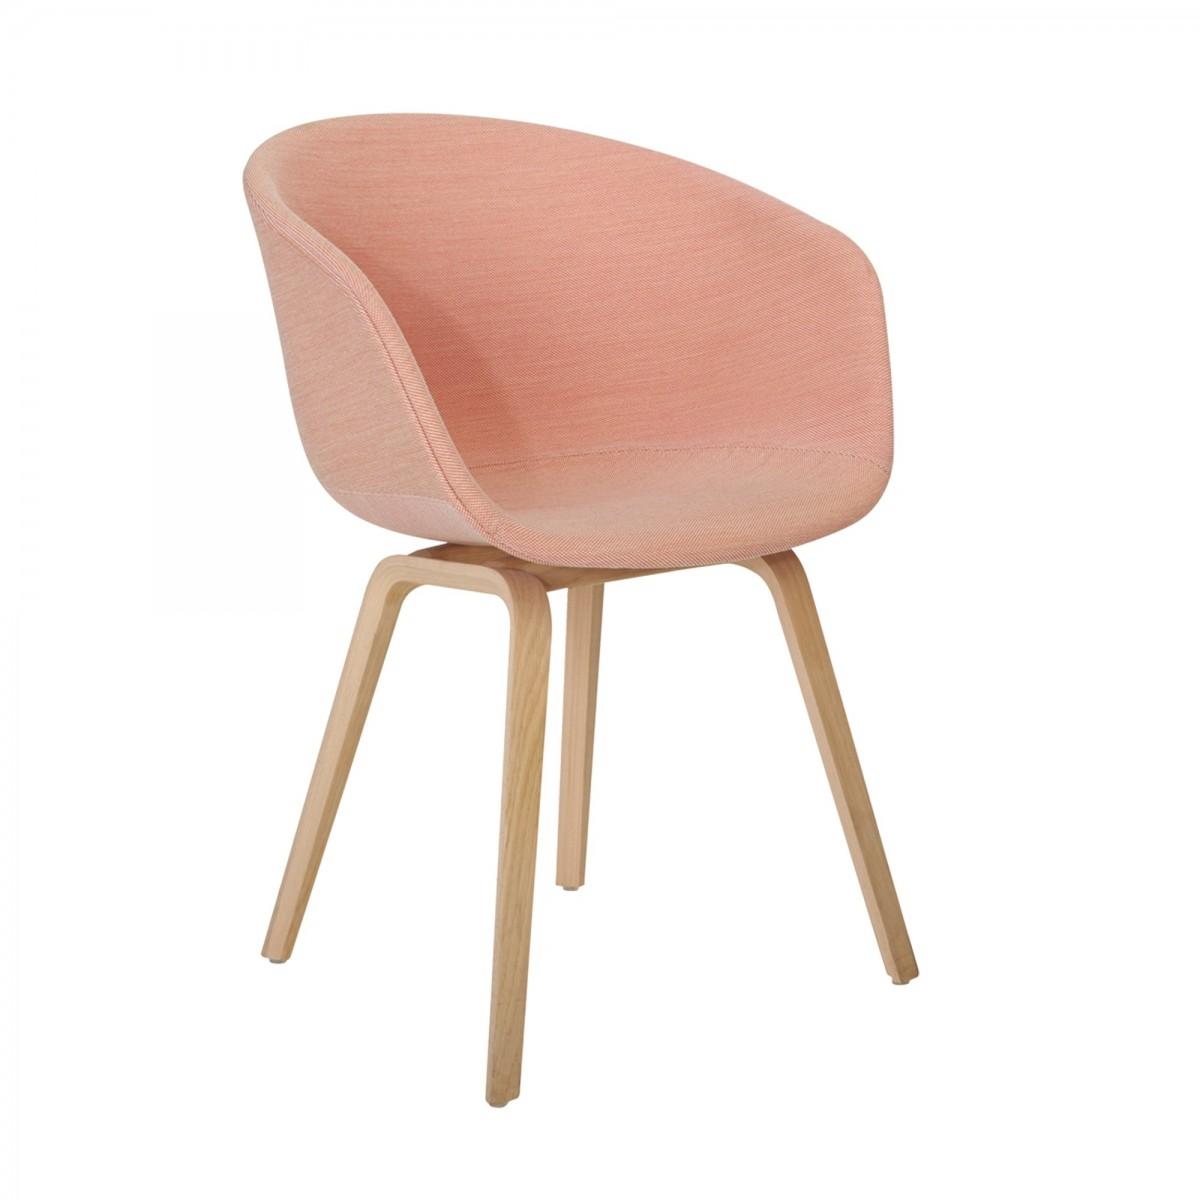 Fauteuil chaise AAC23 en chªne et tissu steelcut trio 515 HAY